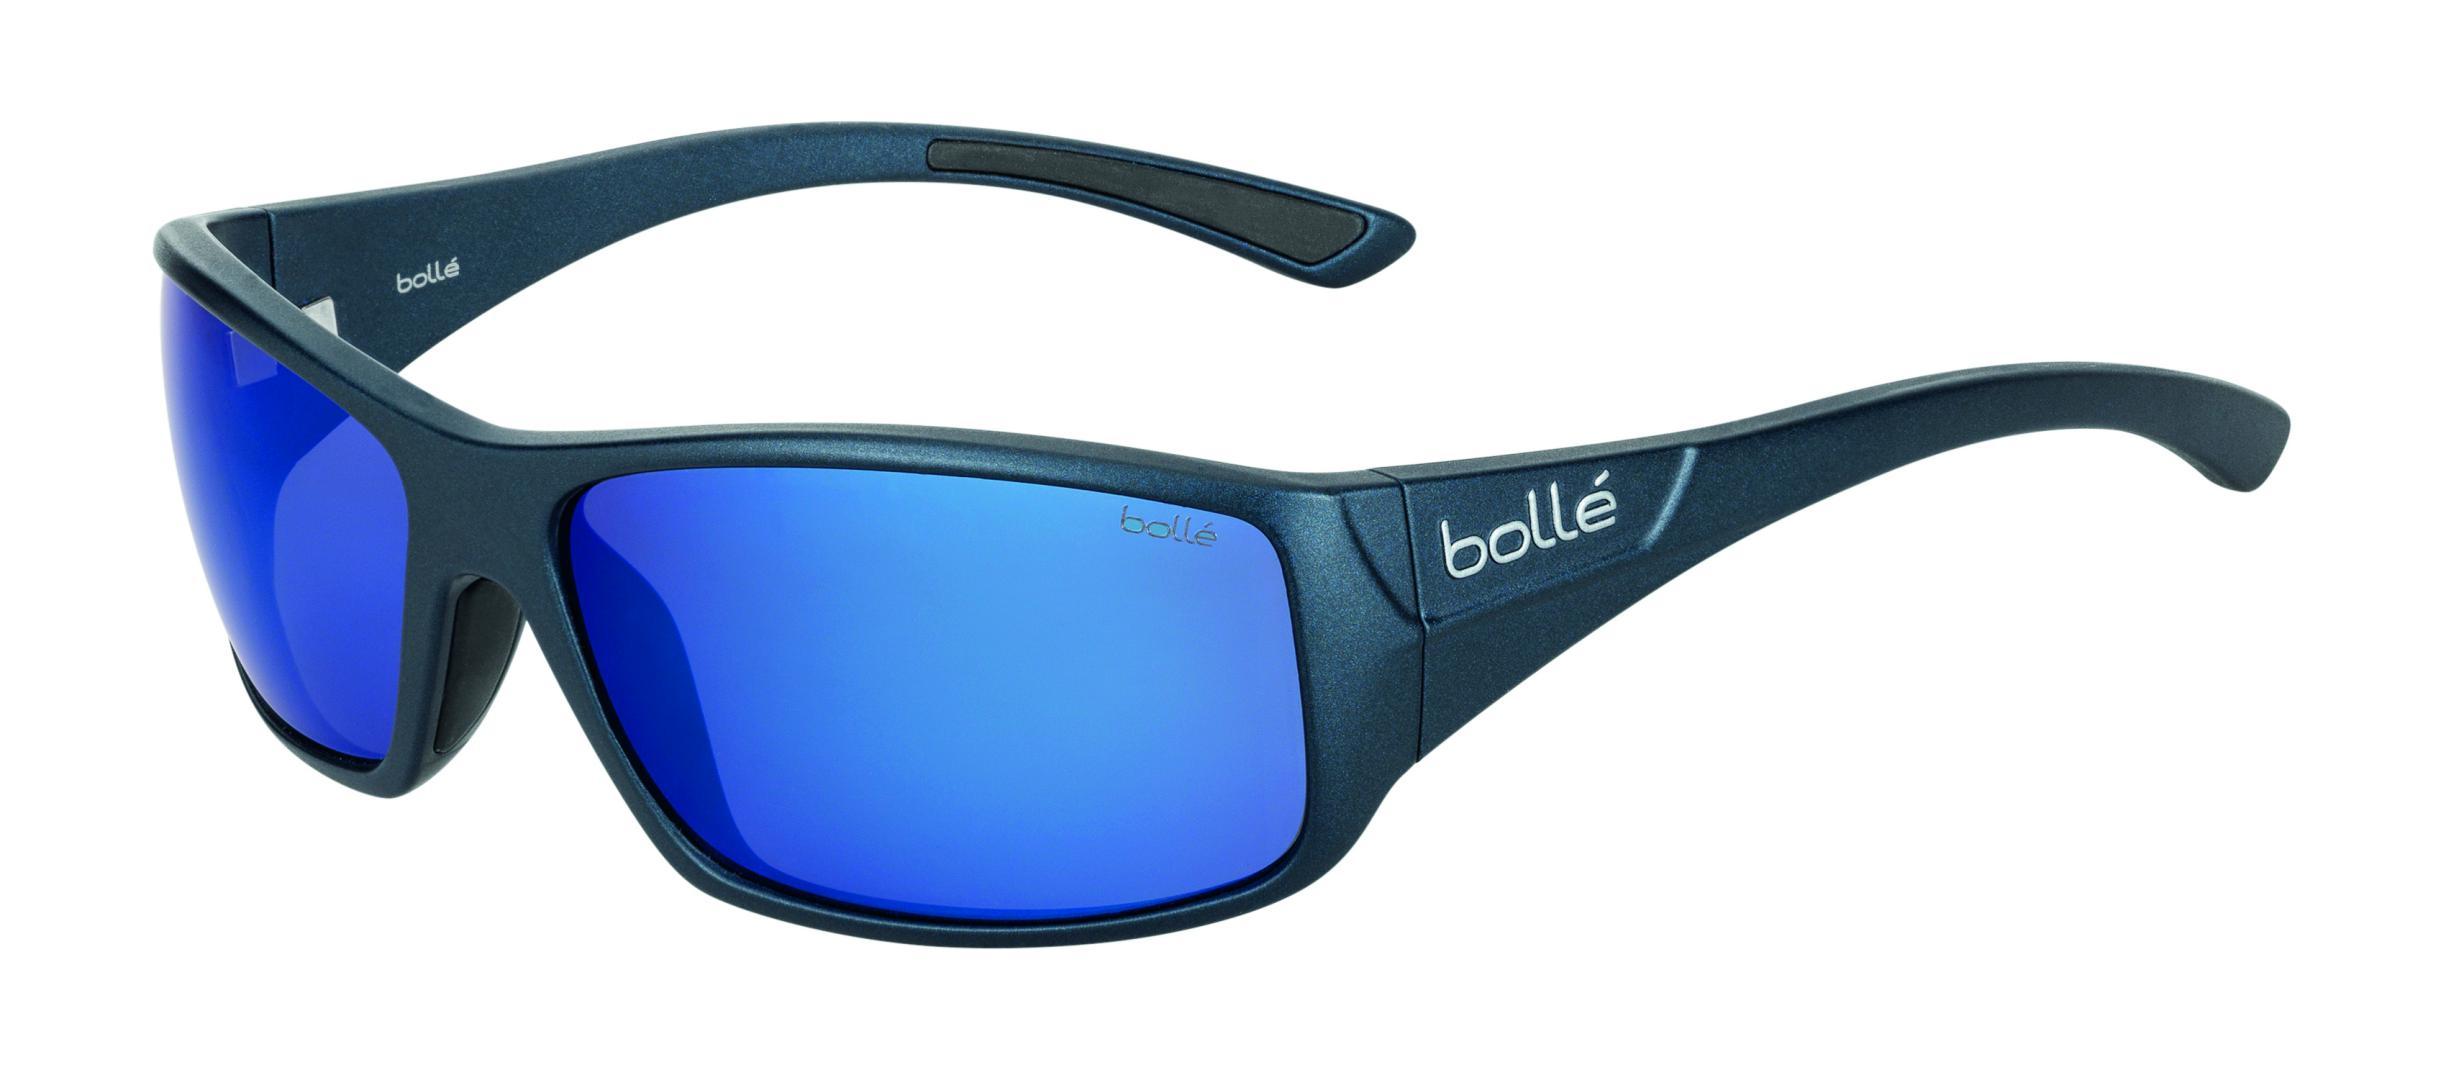 73288d89a7 Gafas de Sol Bollé Kingsnake | eBay